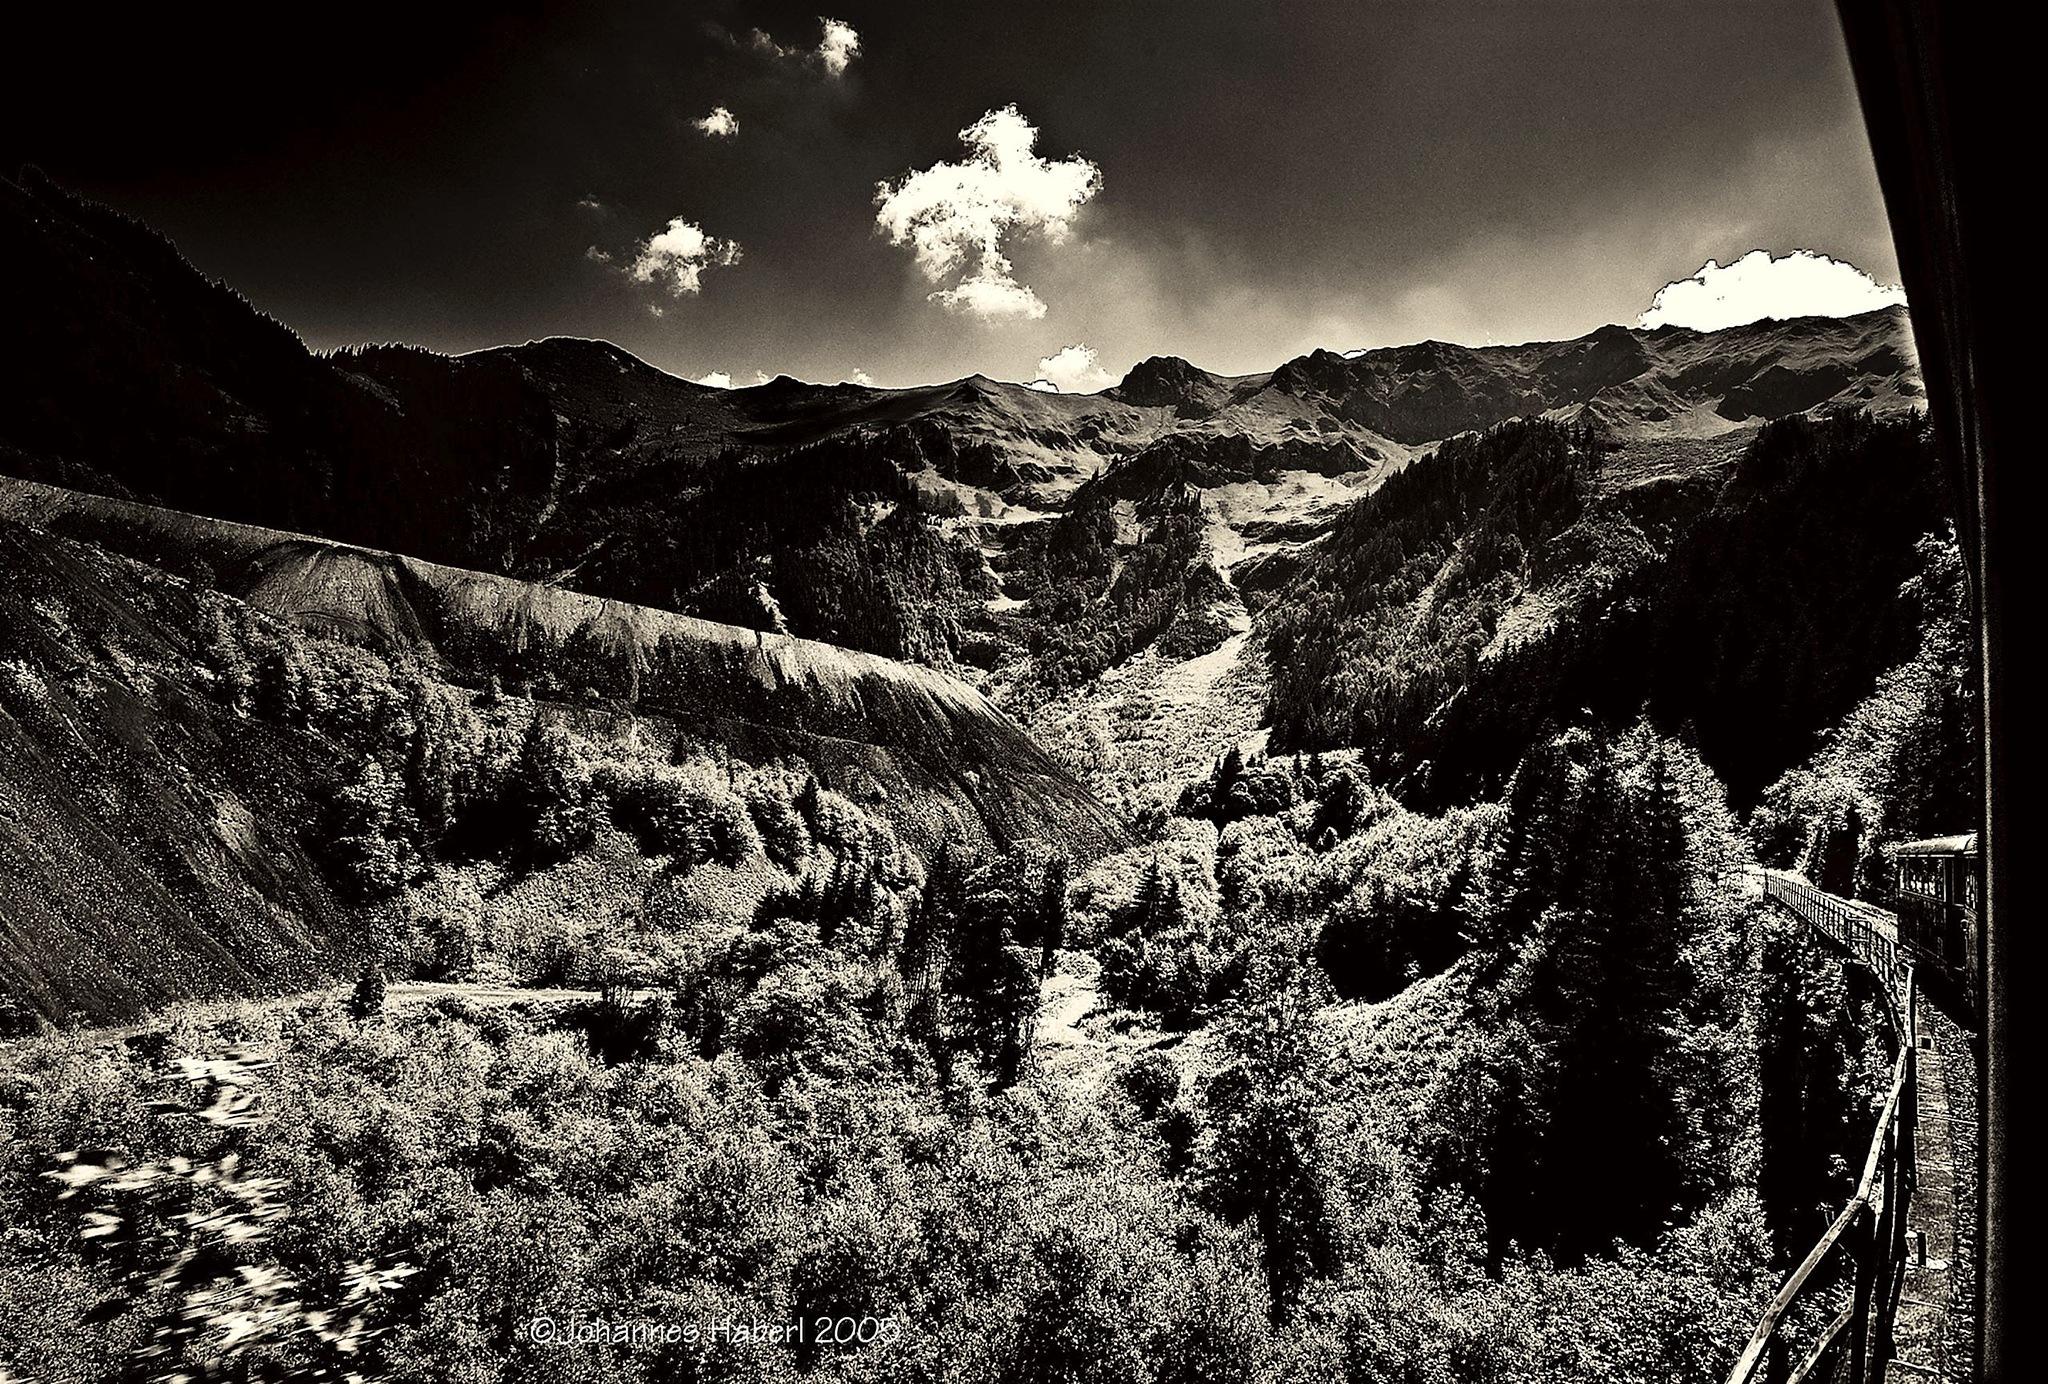 Erzberg - trip with railroad Erzbergbahn IV / B&W, high contrast, toned by Johannes Haberl